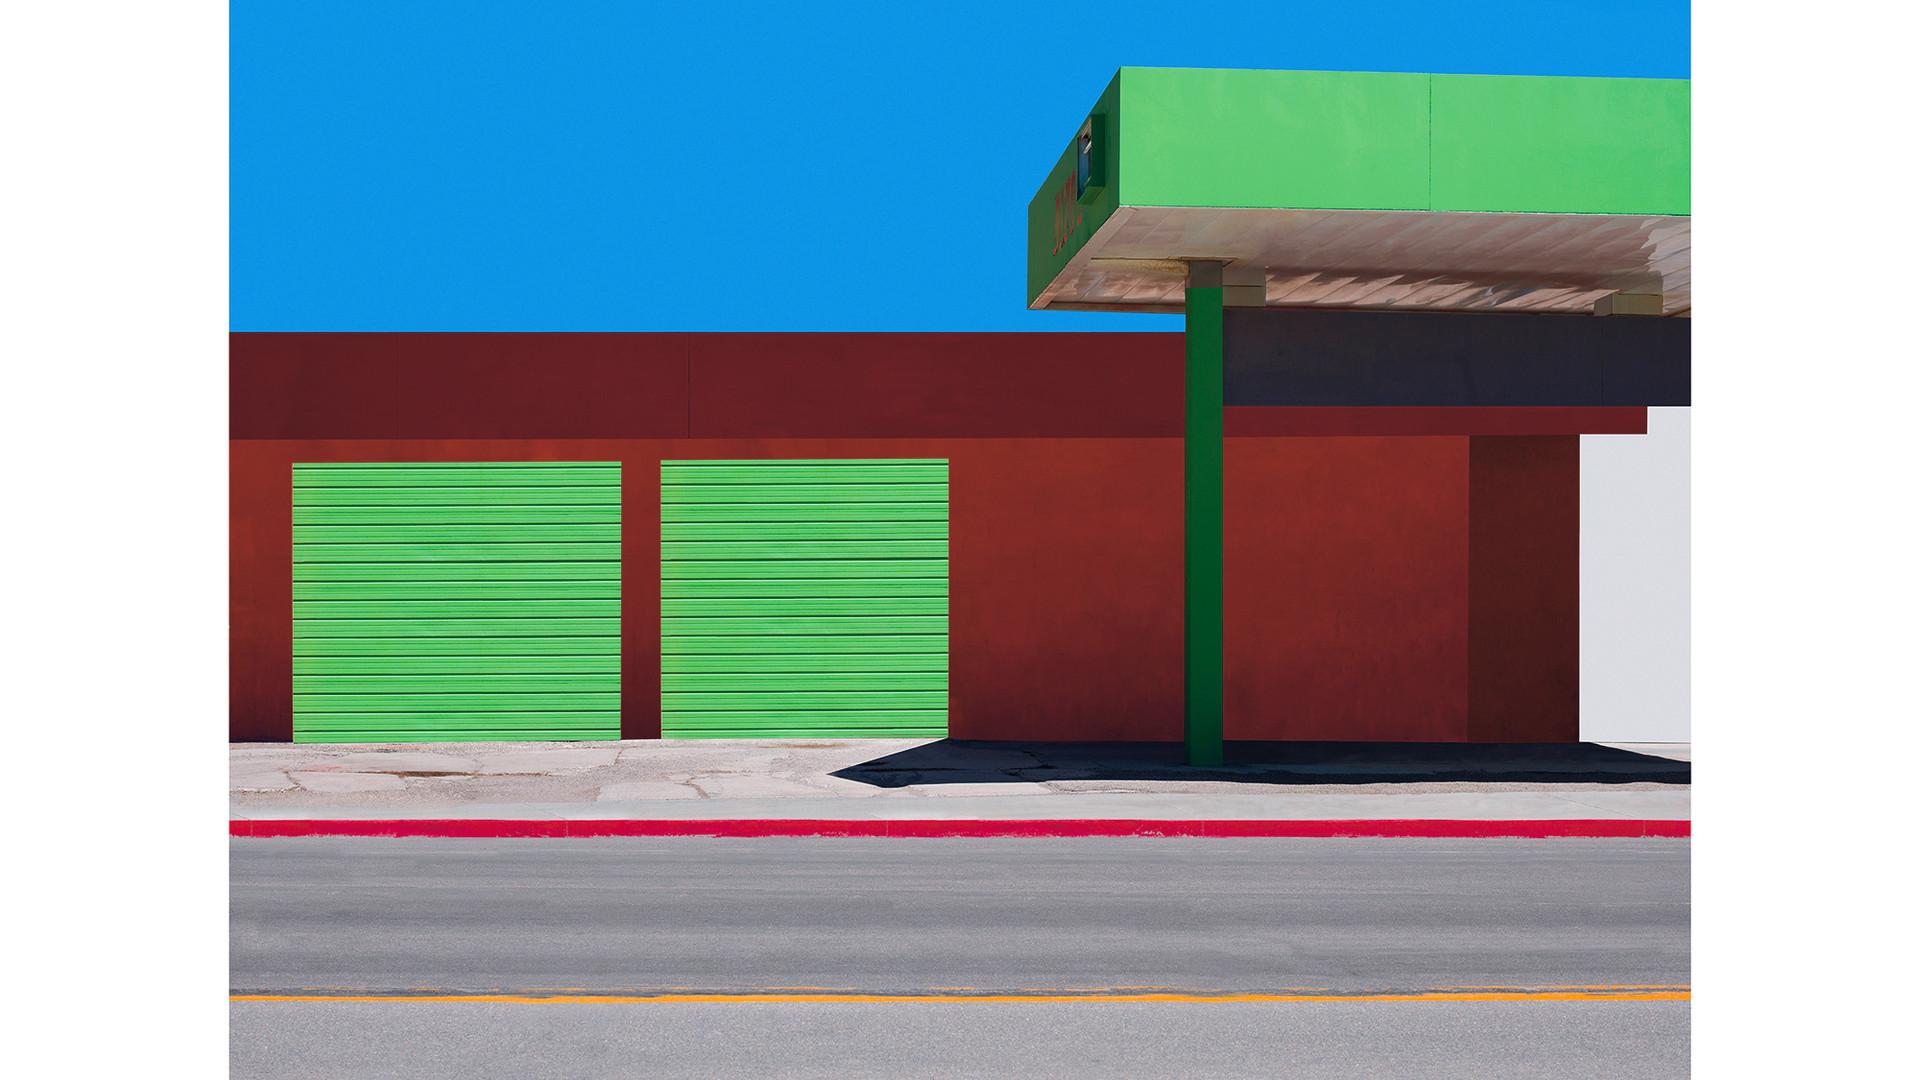 Mina, 2017 125x163cm, archival pigment print, ed. of 7